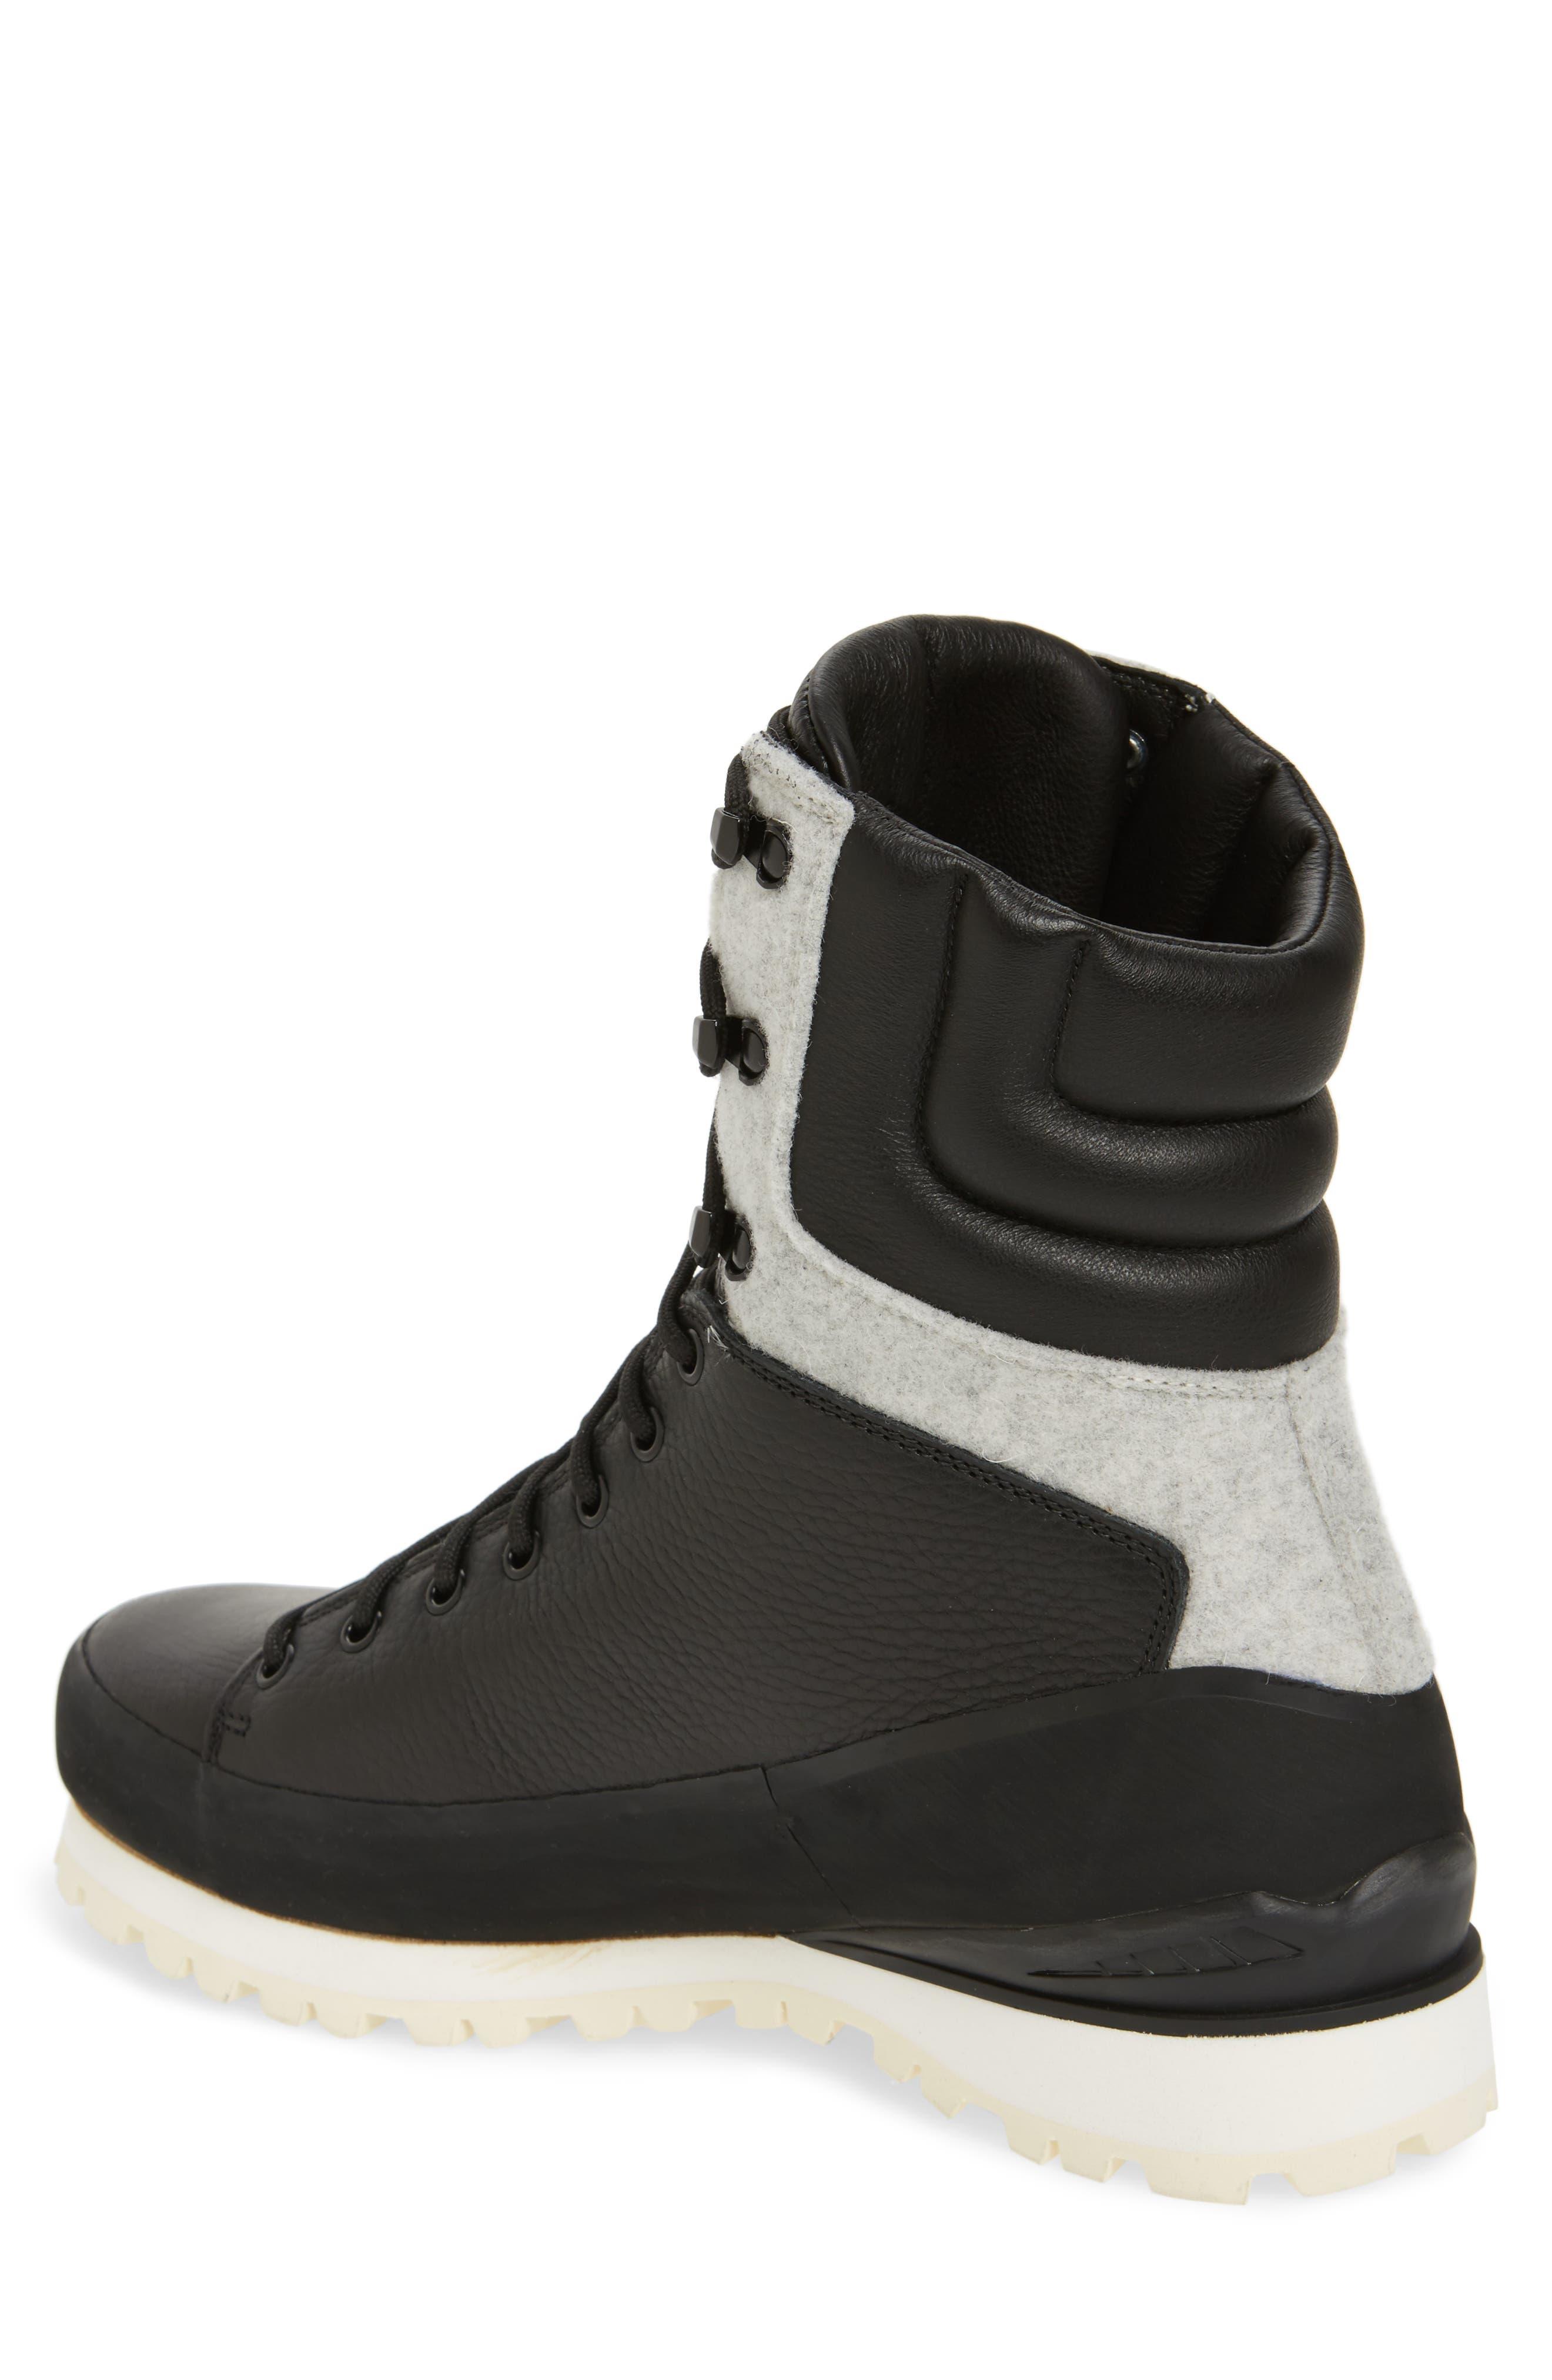 Cryos Boot,                             Alternate thumbnail 2, color,                             TNF BLACK/ GLACIER WHITE